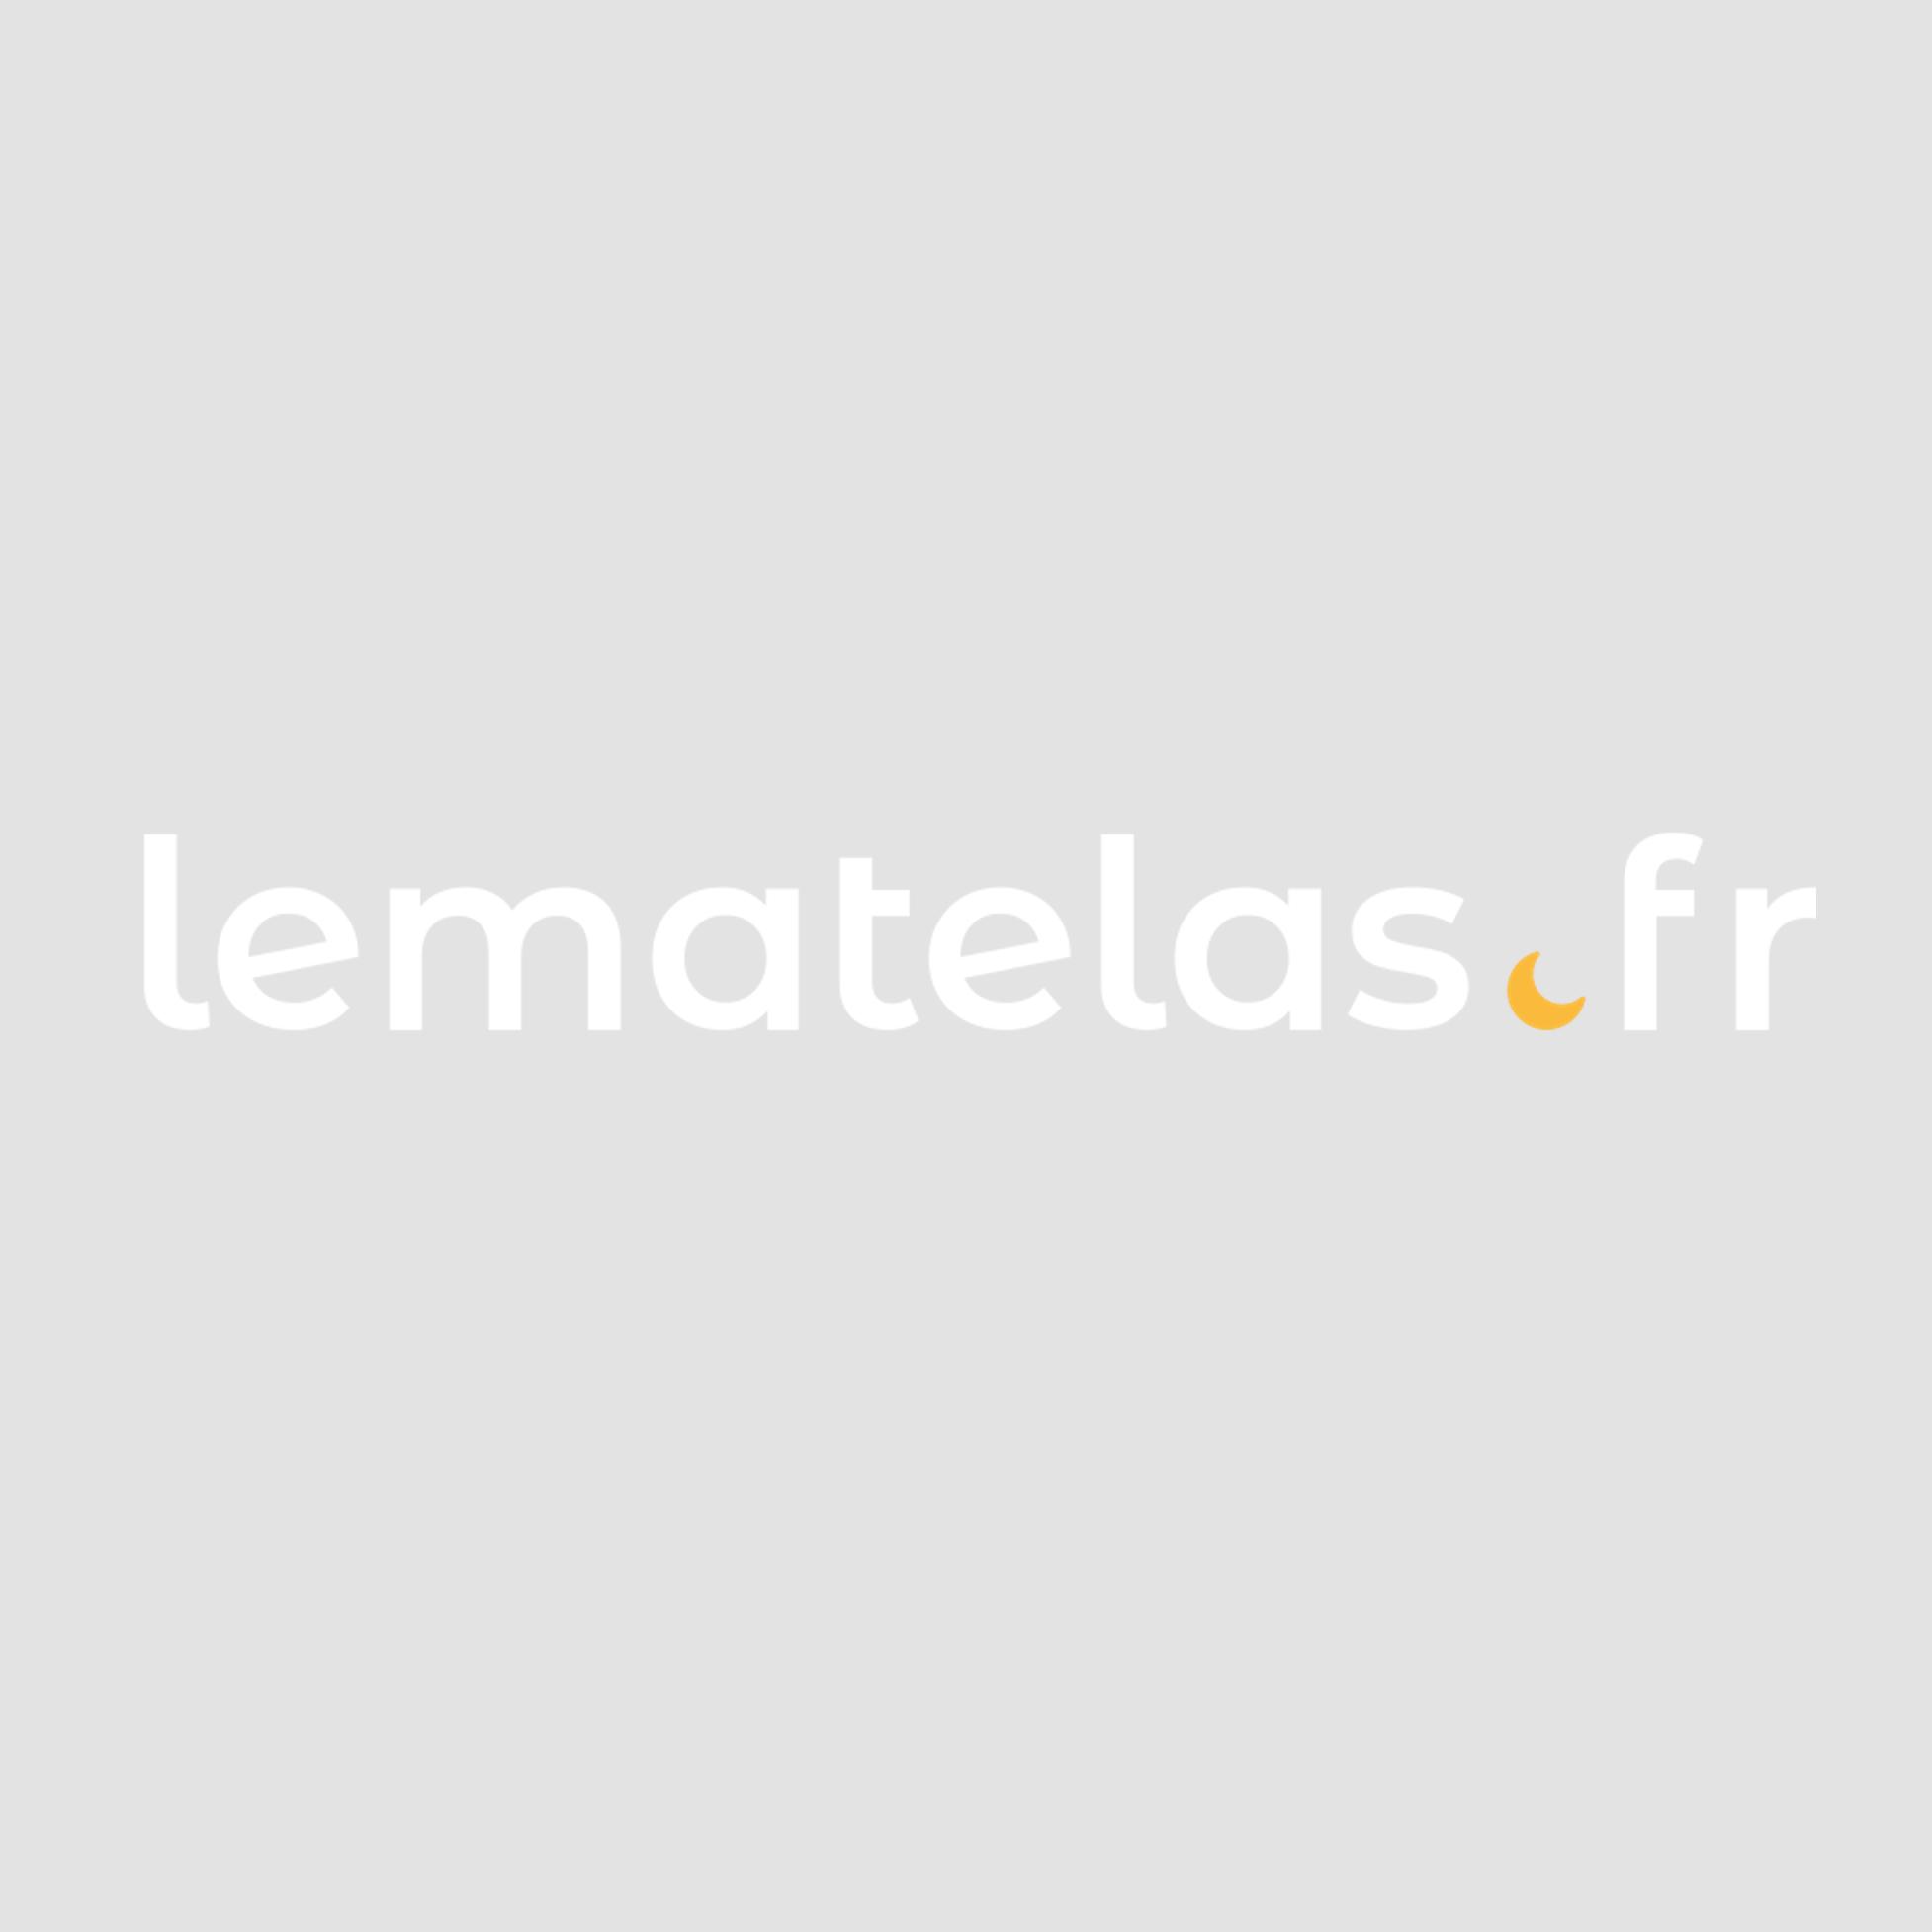 Ensemble Lit futon style japonais + matelas futon noir 180x200